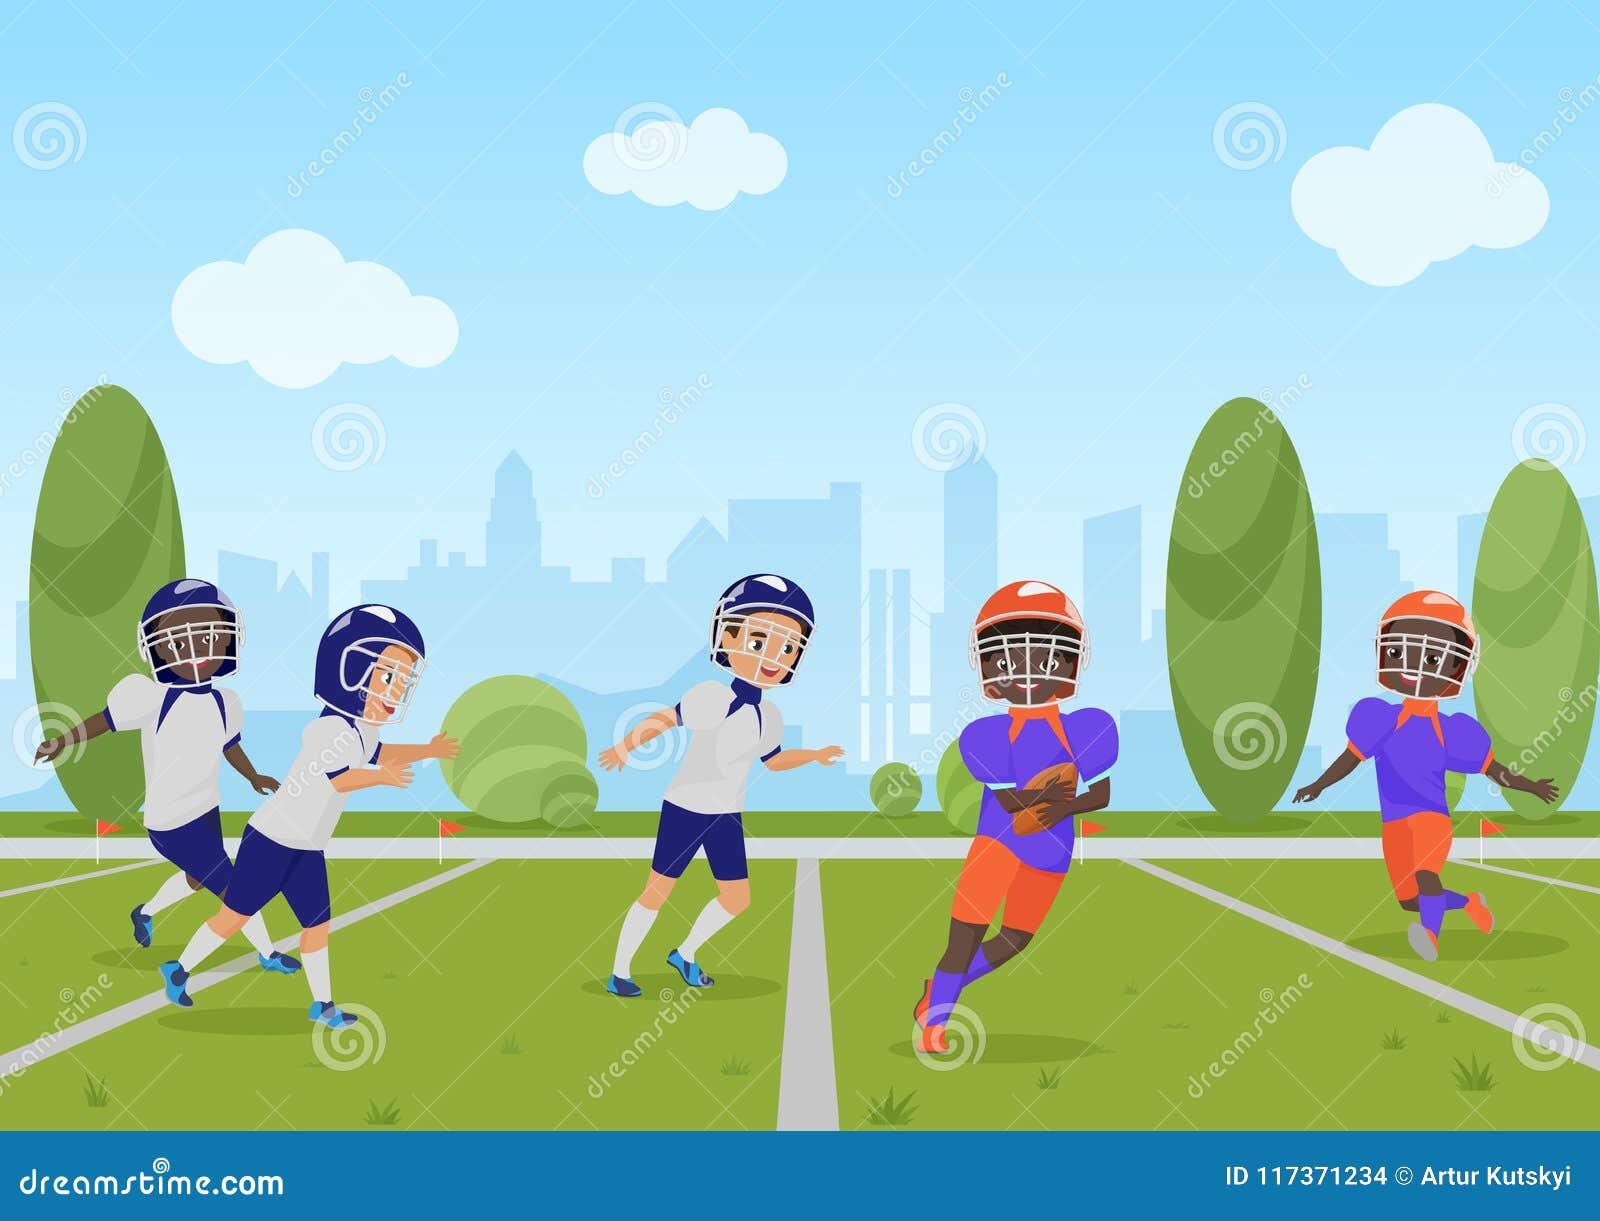 Kids Children Playing American Football Match. Vector ...